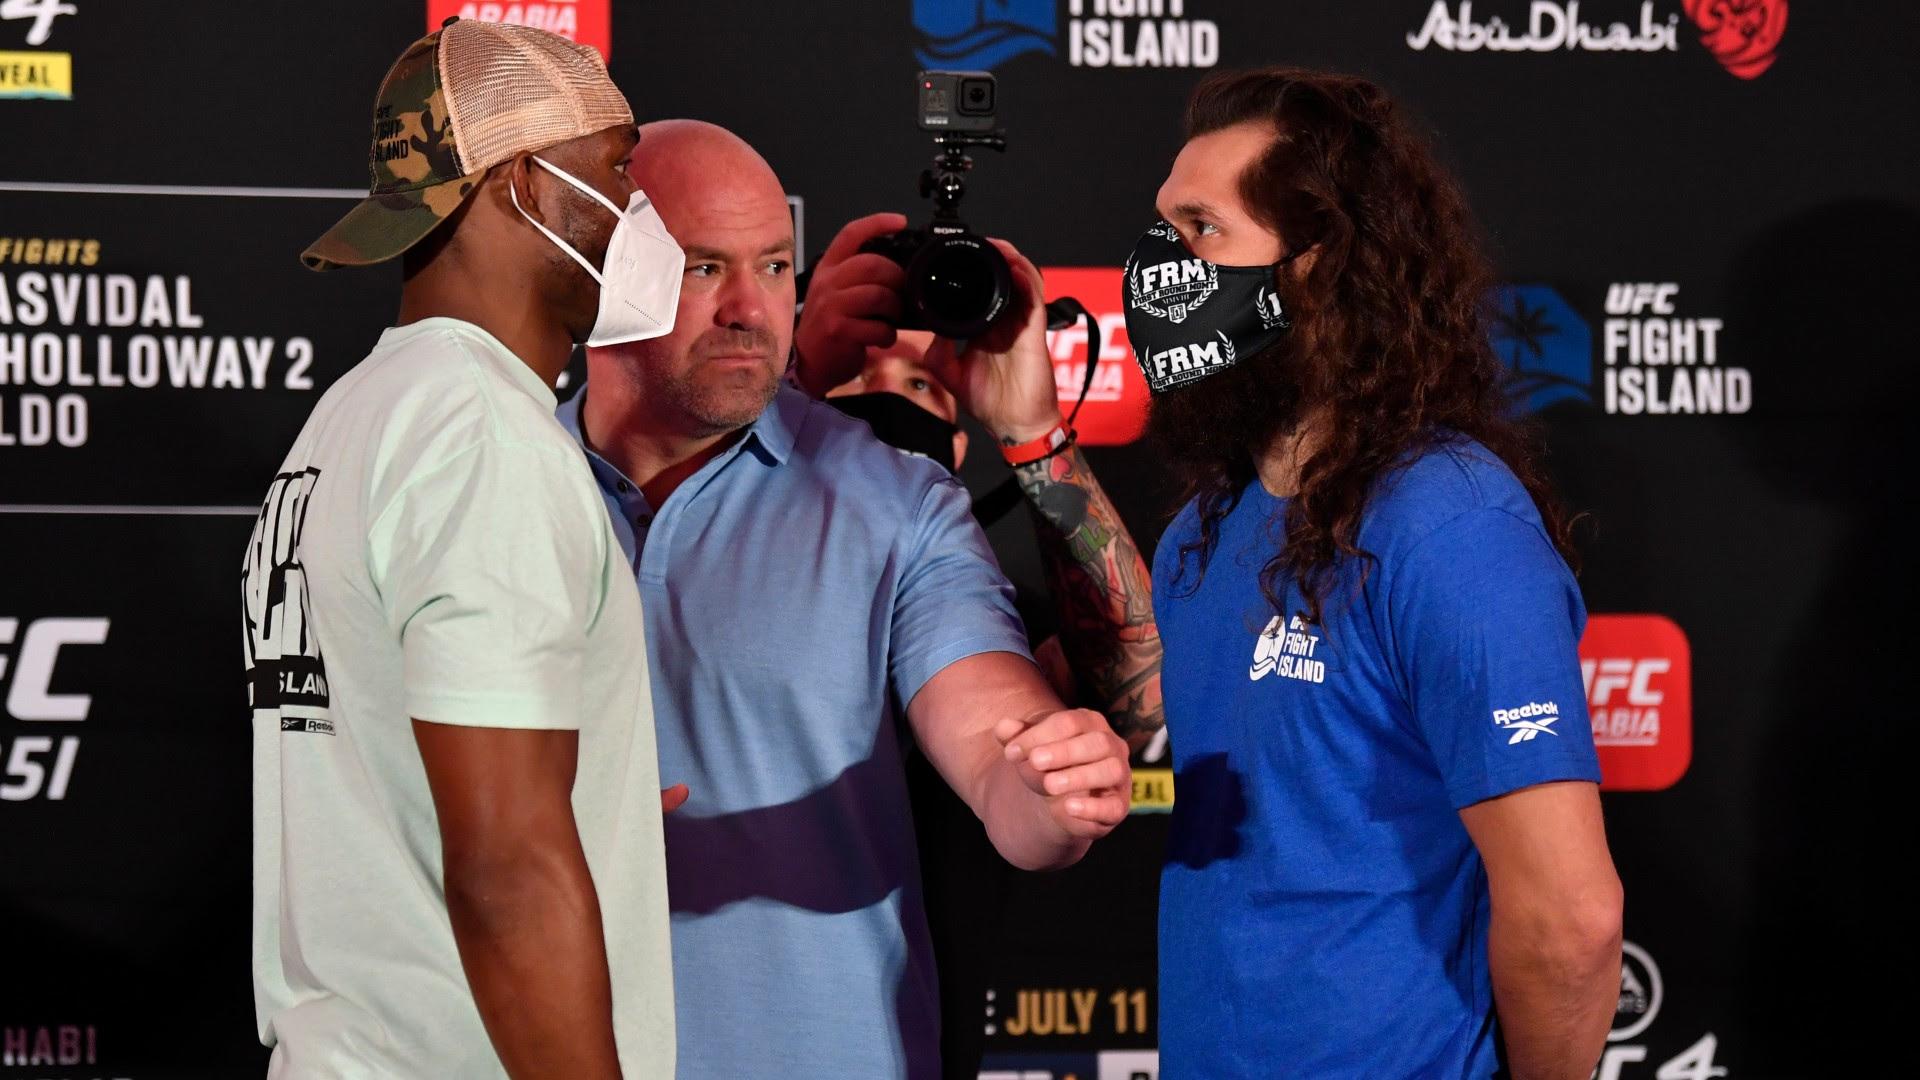 UFC 261 results: Kamaru Usman retains welterweight title with 2nd-round KO of Jorge Masvidal